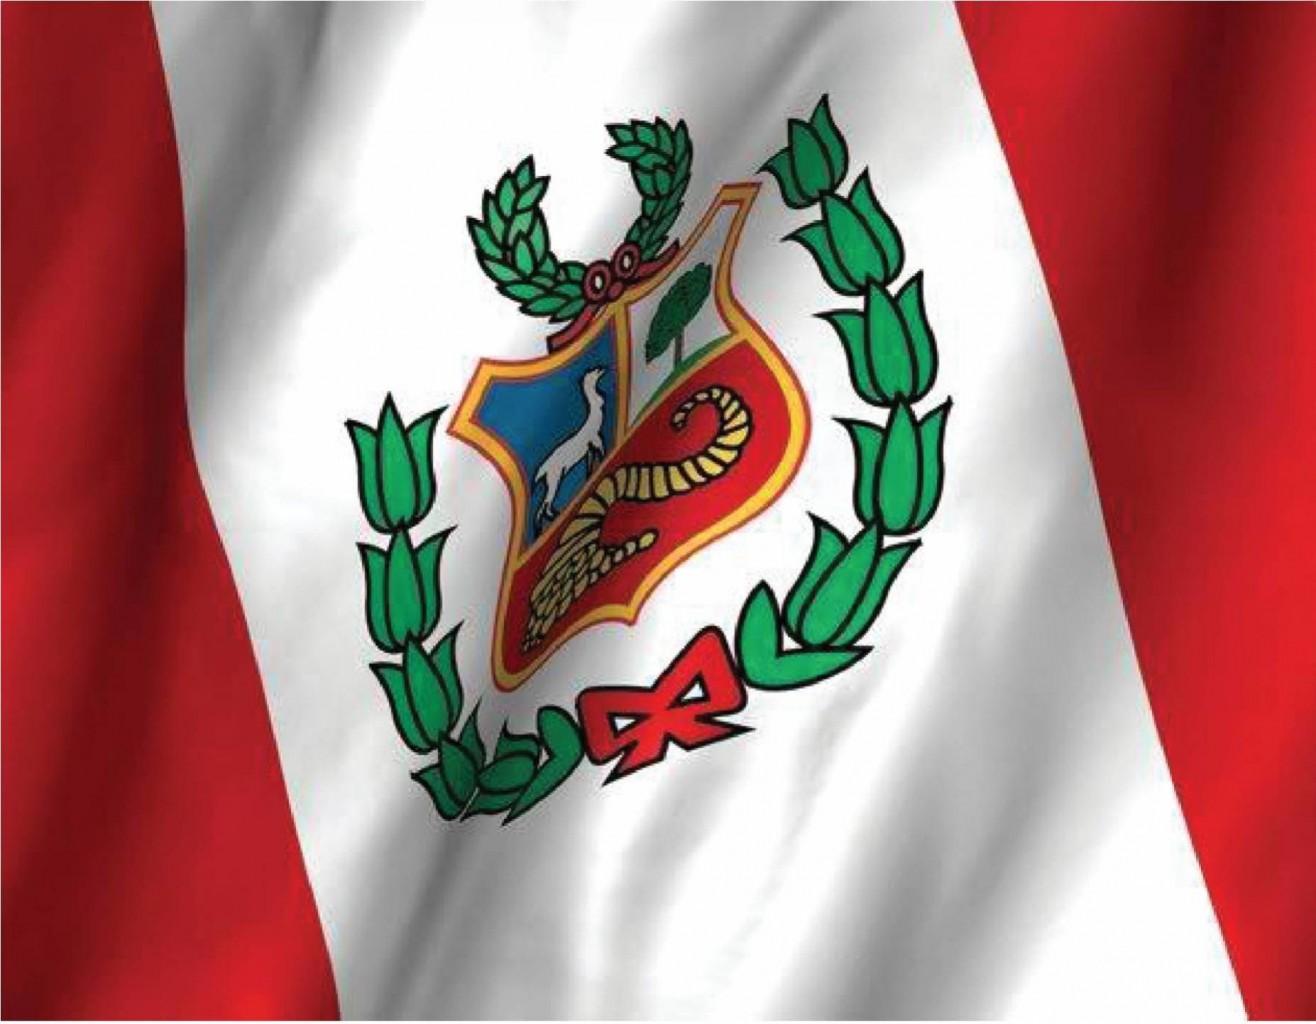 REFERENDUM NACIONAL PERÚ 2018